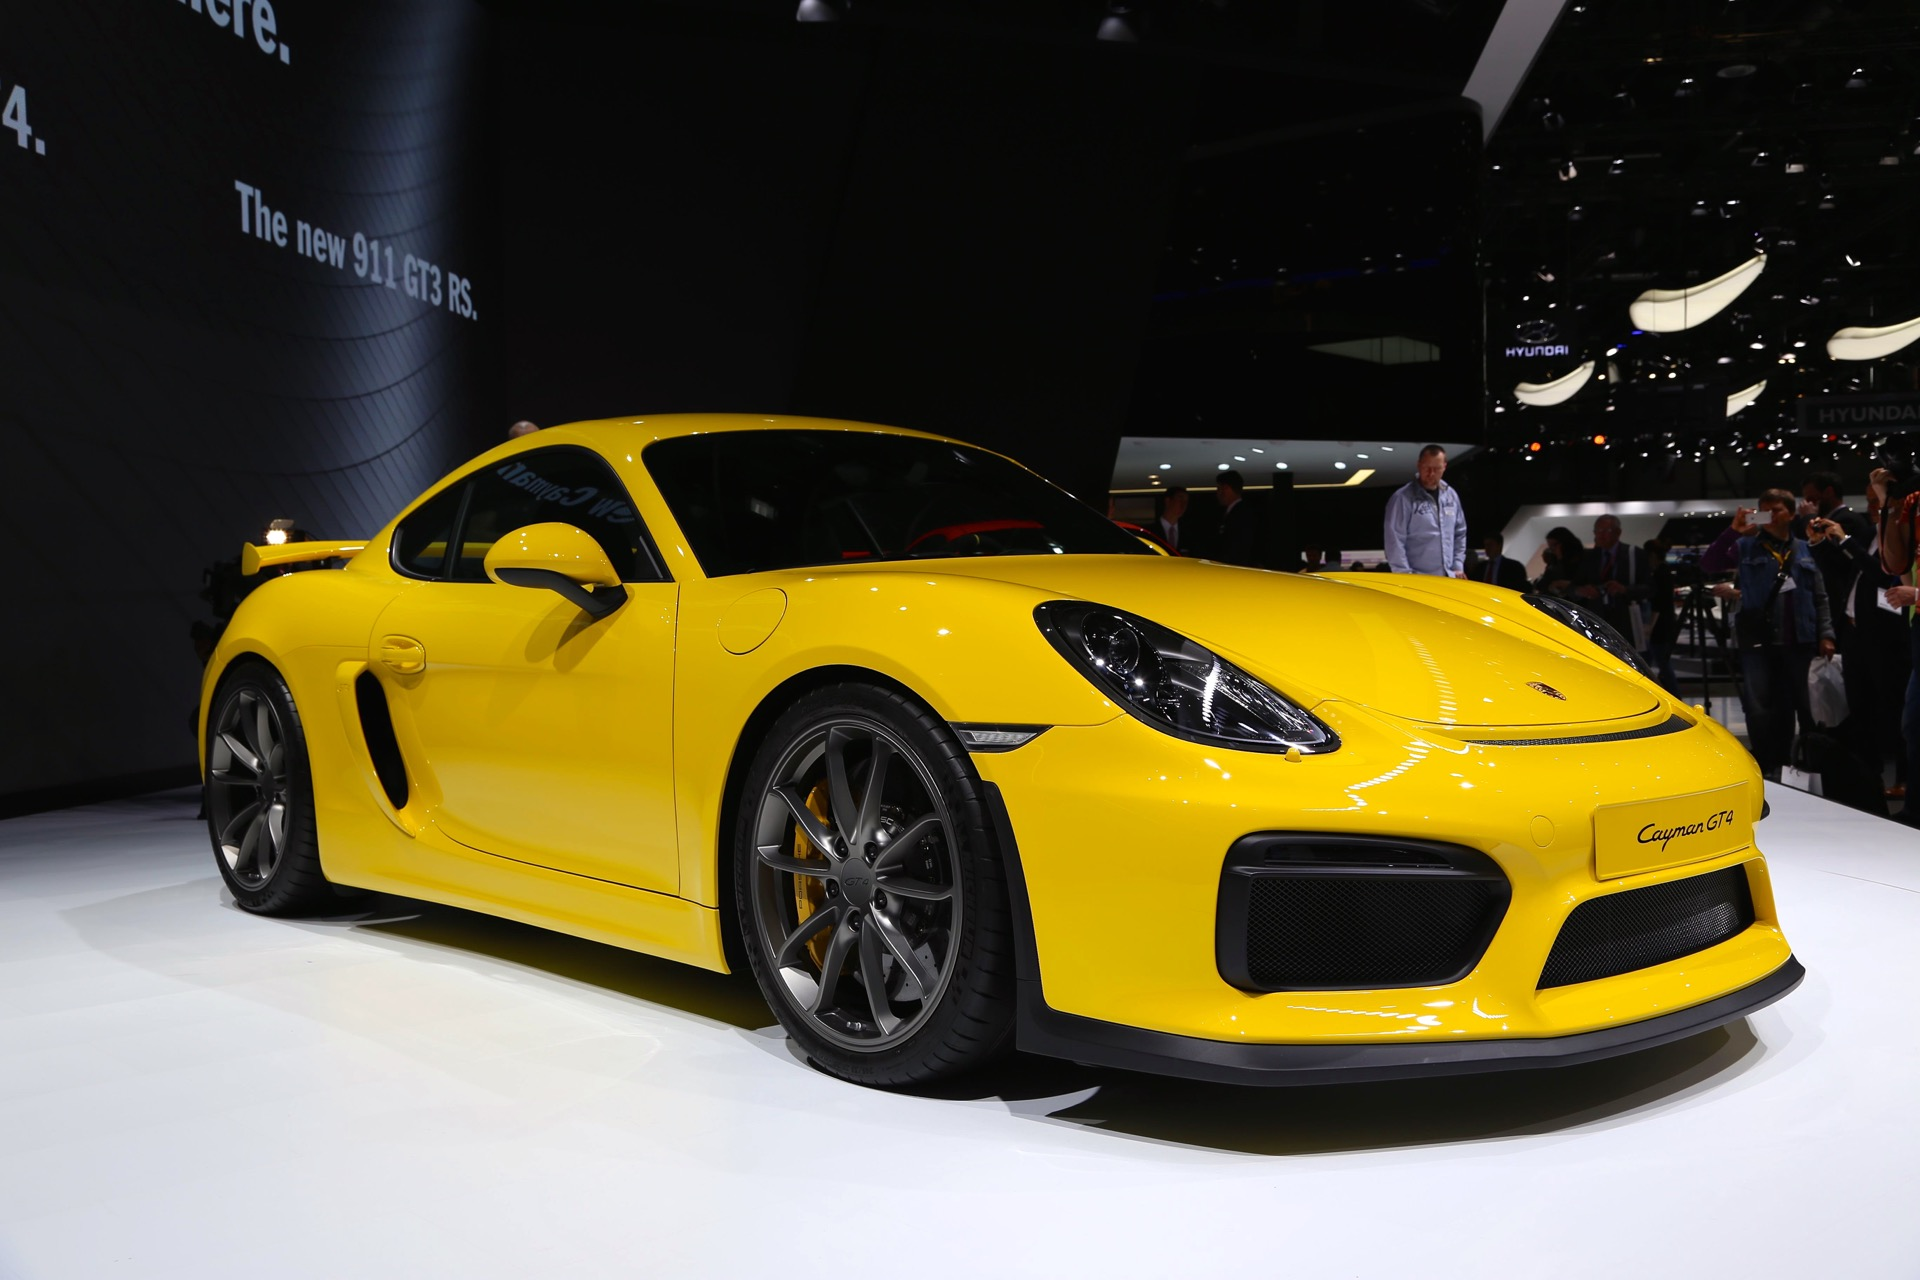 2019 Porsche 911 Turbo S >> 2016 Porsche Cayman GT4 debuts at the 2015 Geneva auto show